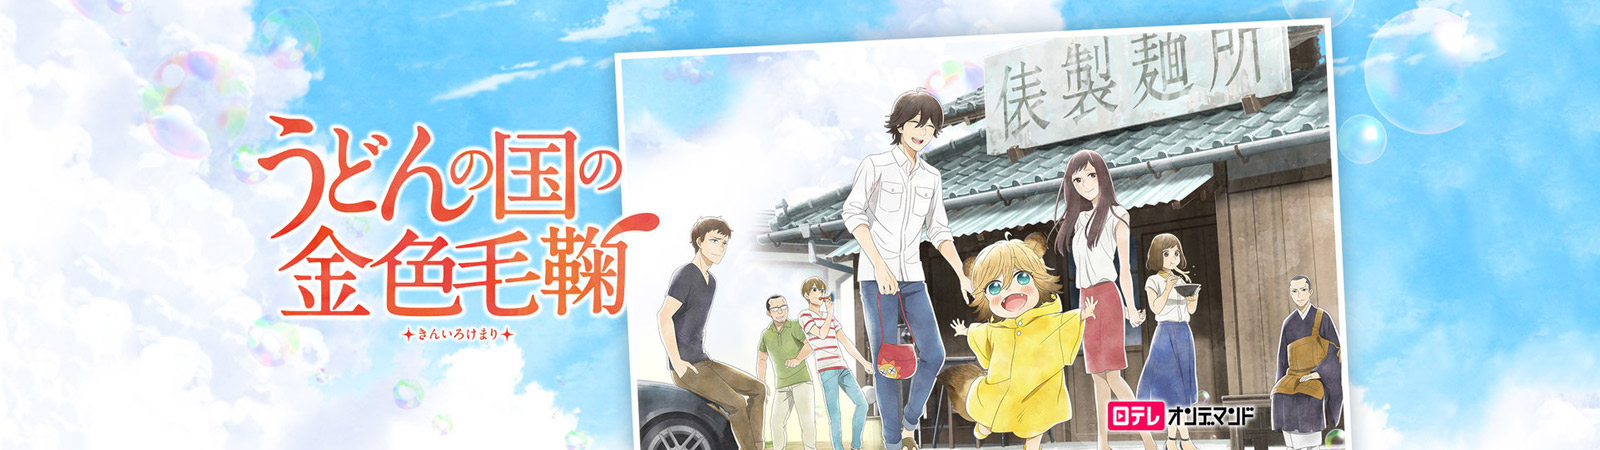 Tập 9 - Udon No Kuni No Kiniro Kemari